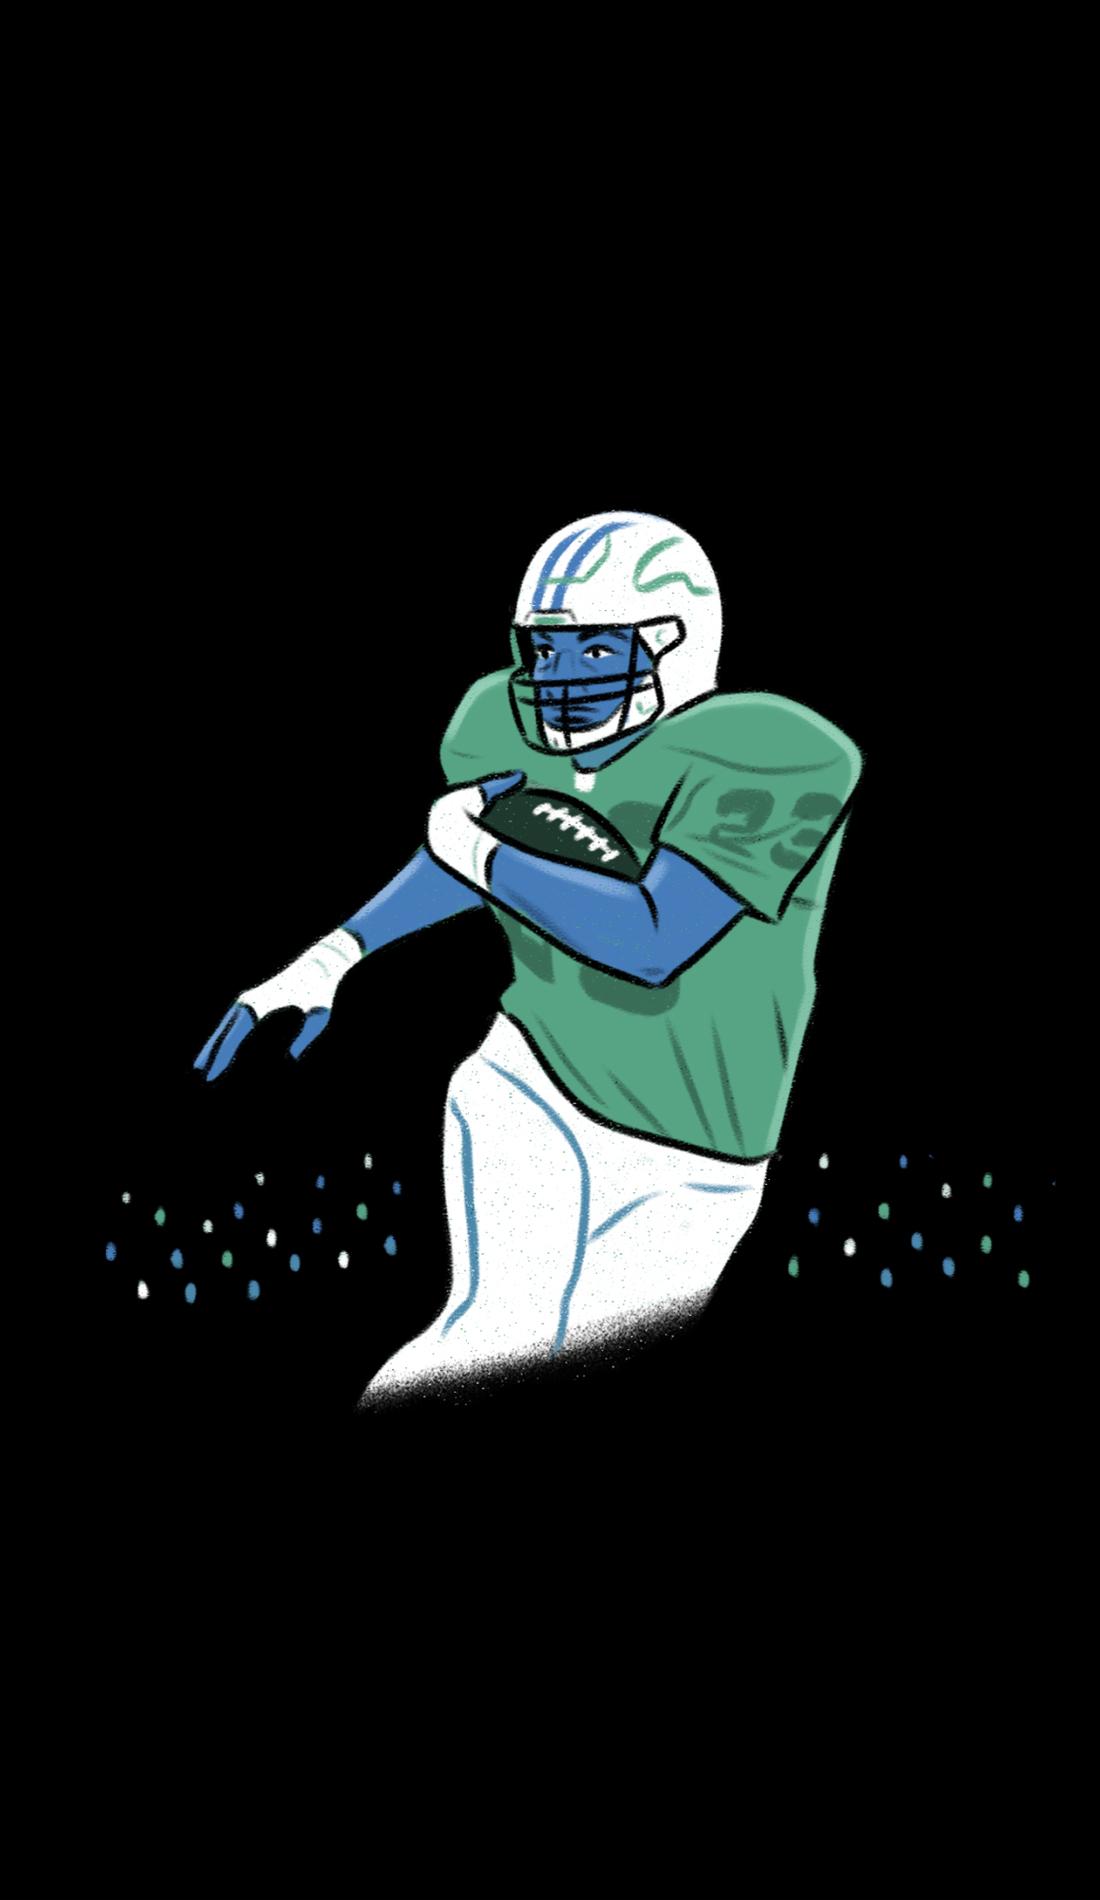 A Pennsylvania Quakers Football live event